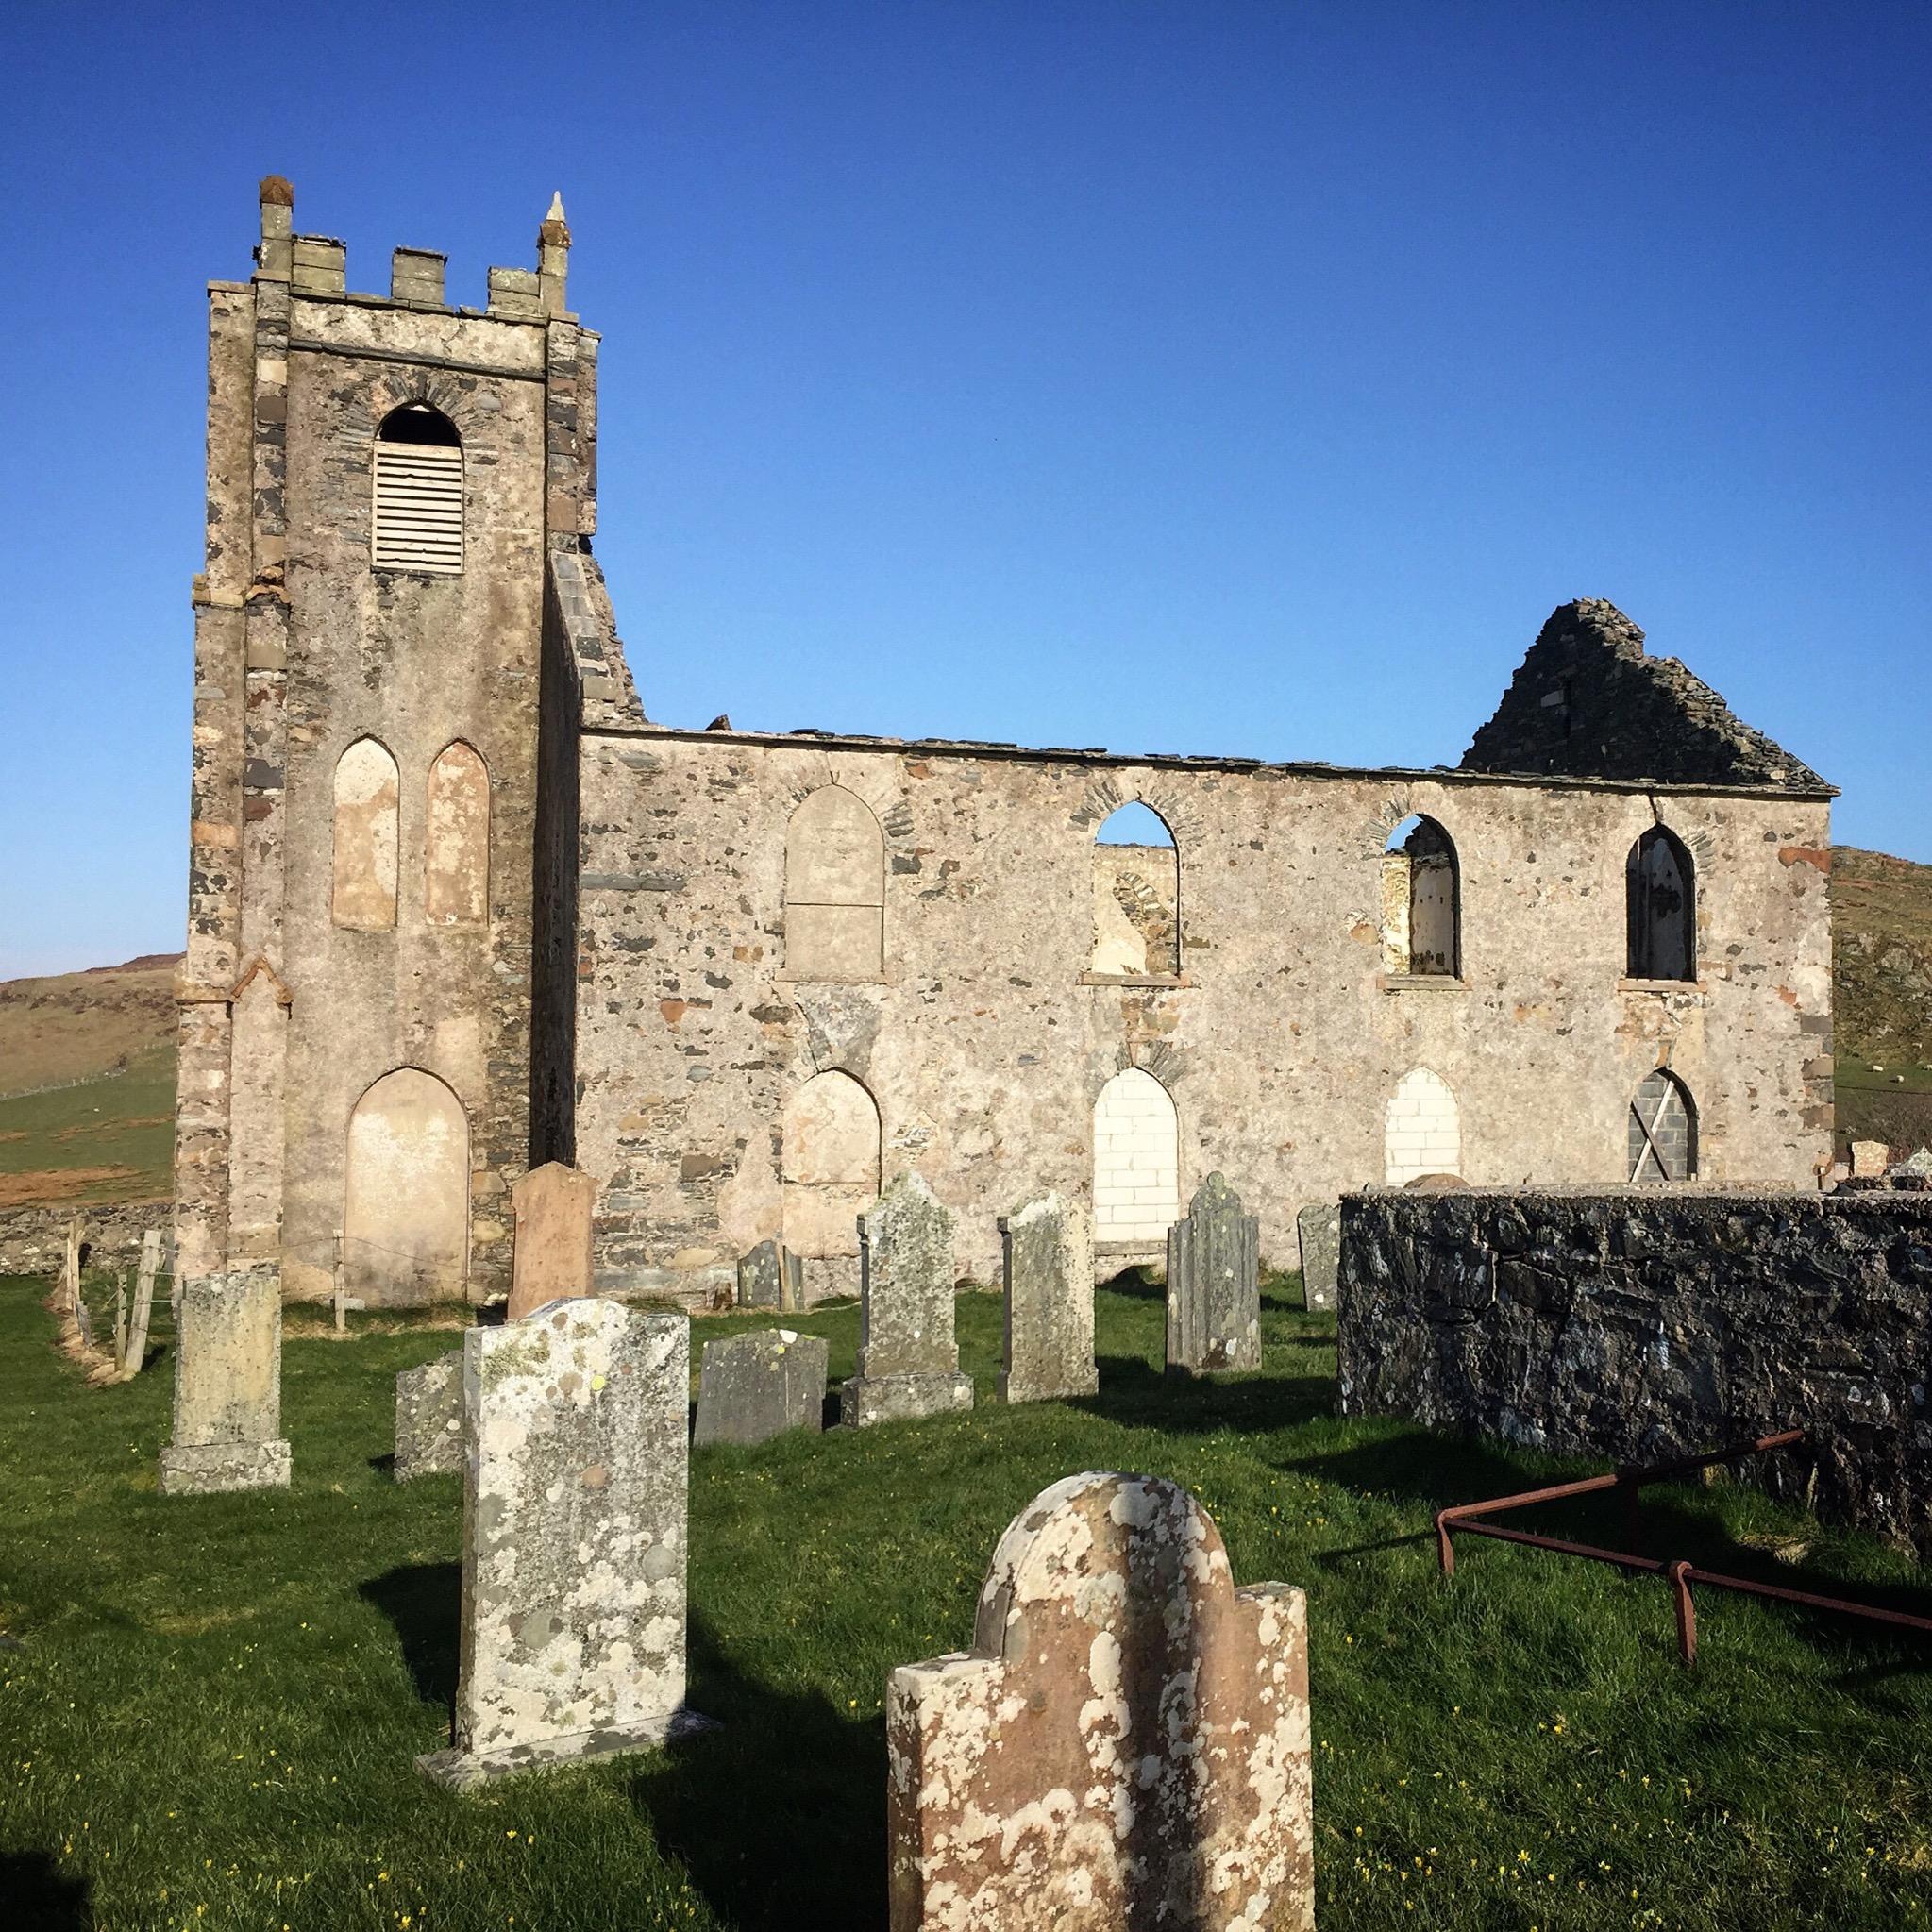 The Ruins of the Kilfinichen church